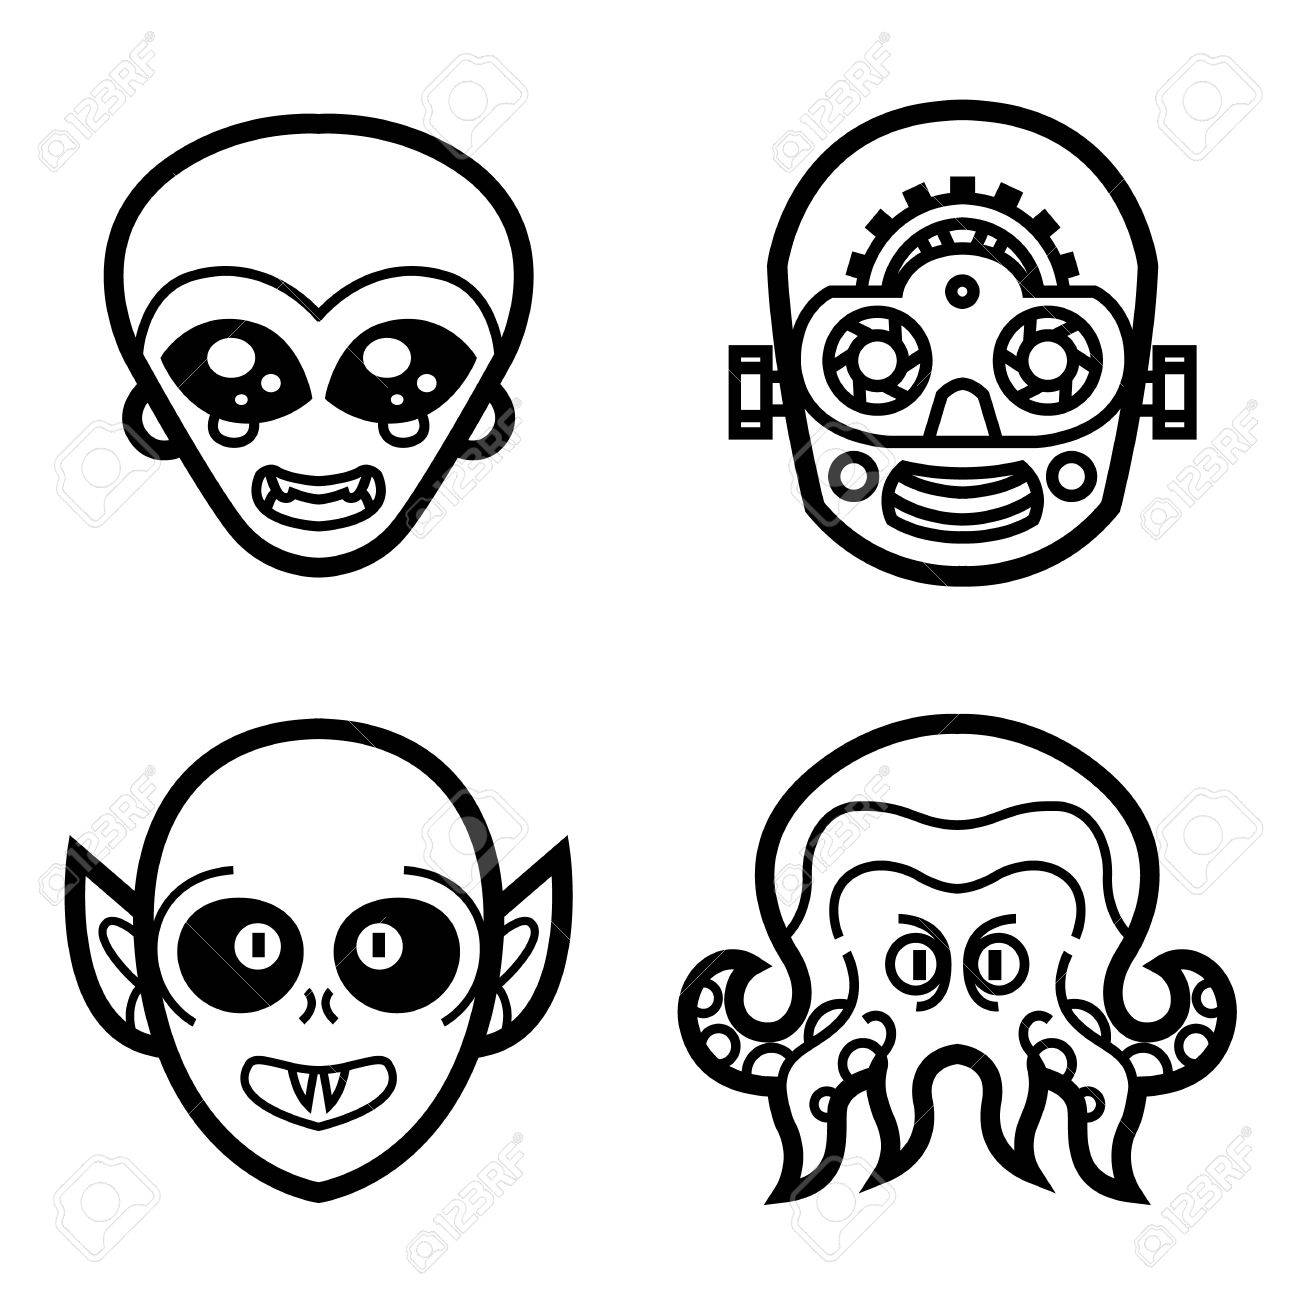 1300x1300 Vampire Ghoul Alien Extraterrestrial Robot Cyborg Monsters Cute